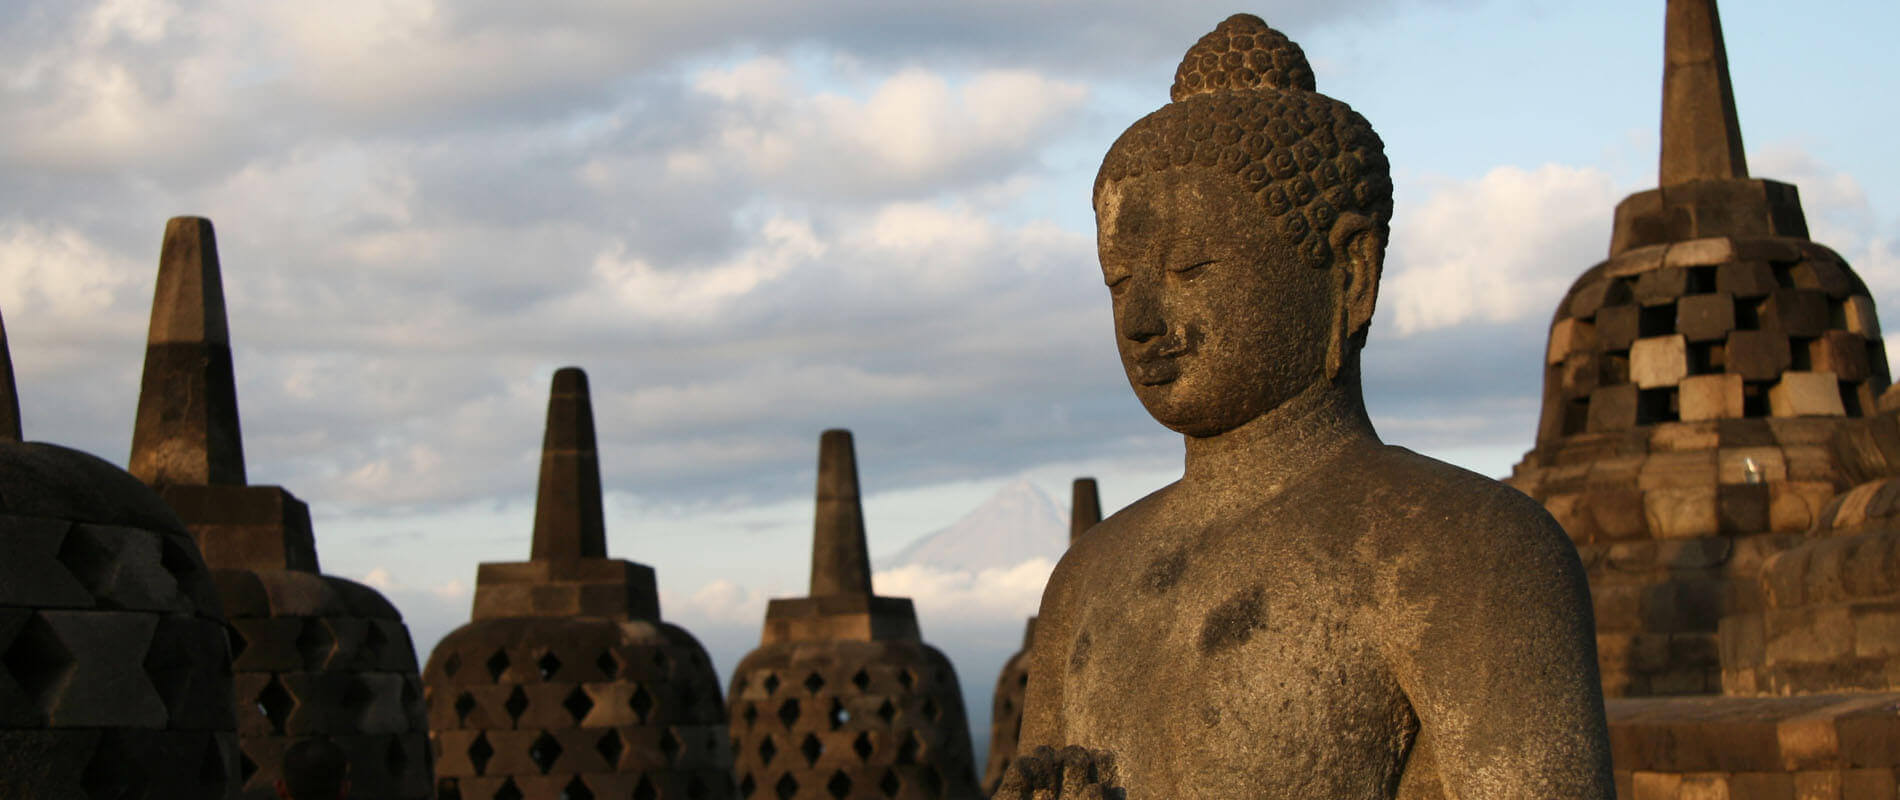 Angkor Tours - Idonézia utazás 2